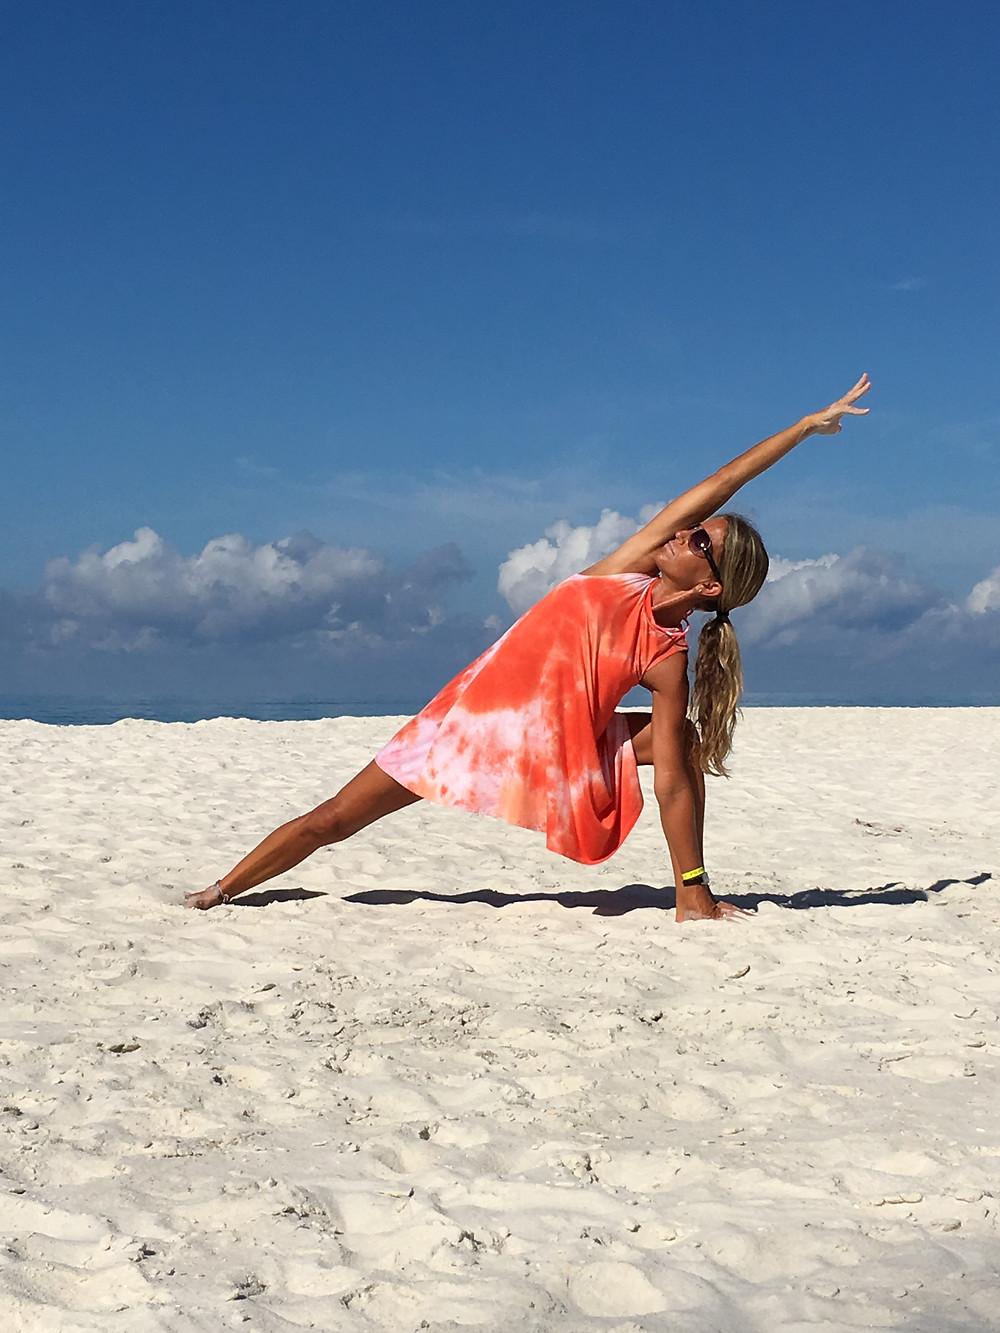 Shauna Gilsdorf in side angle at the beach